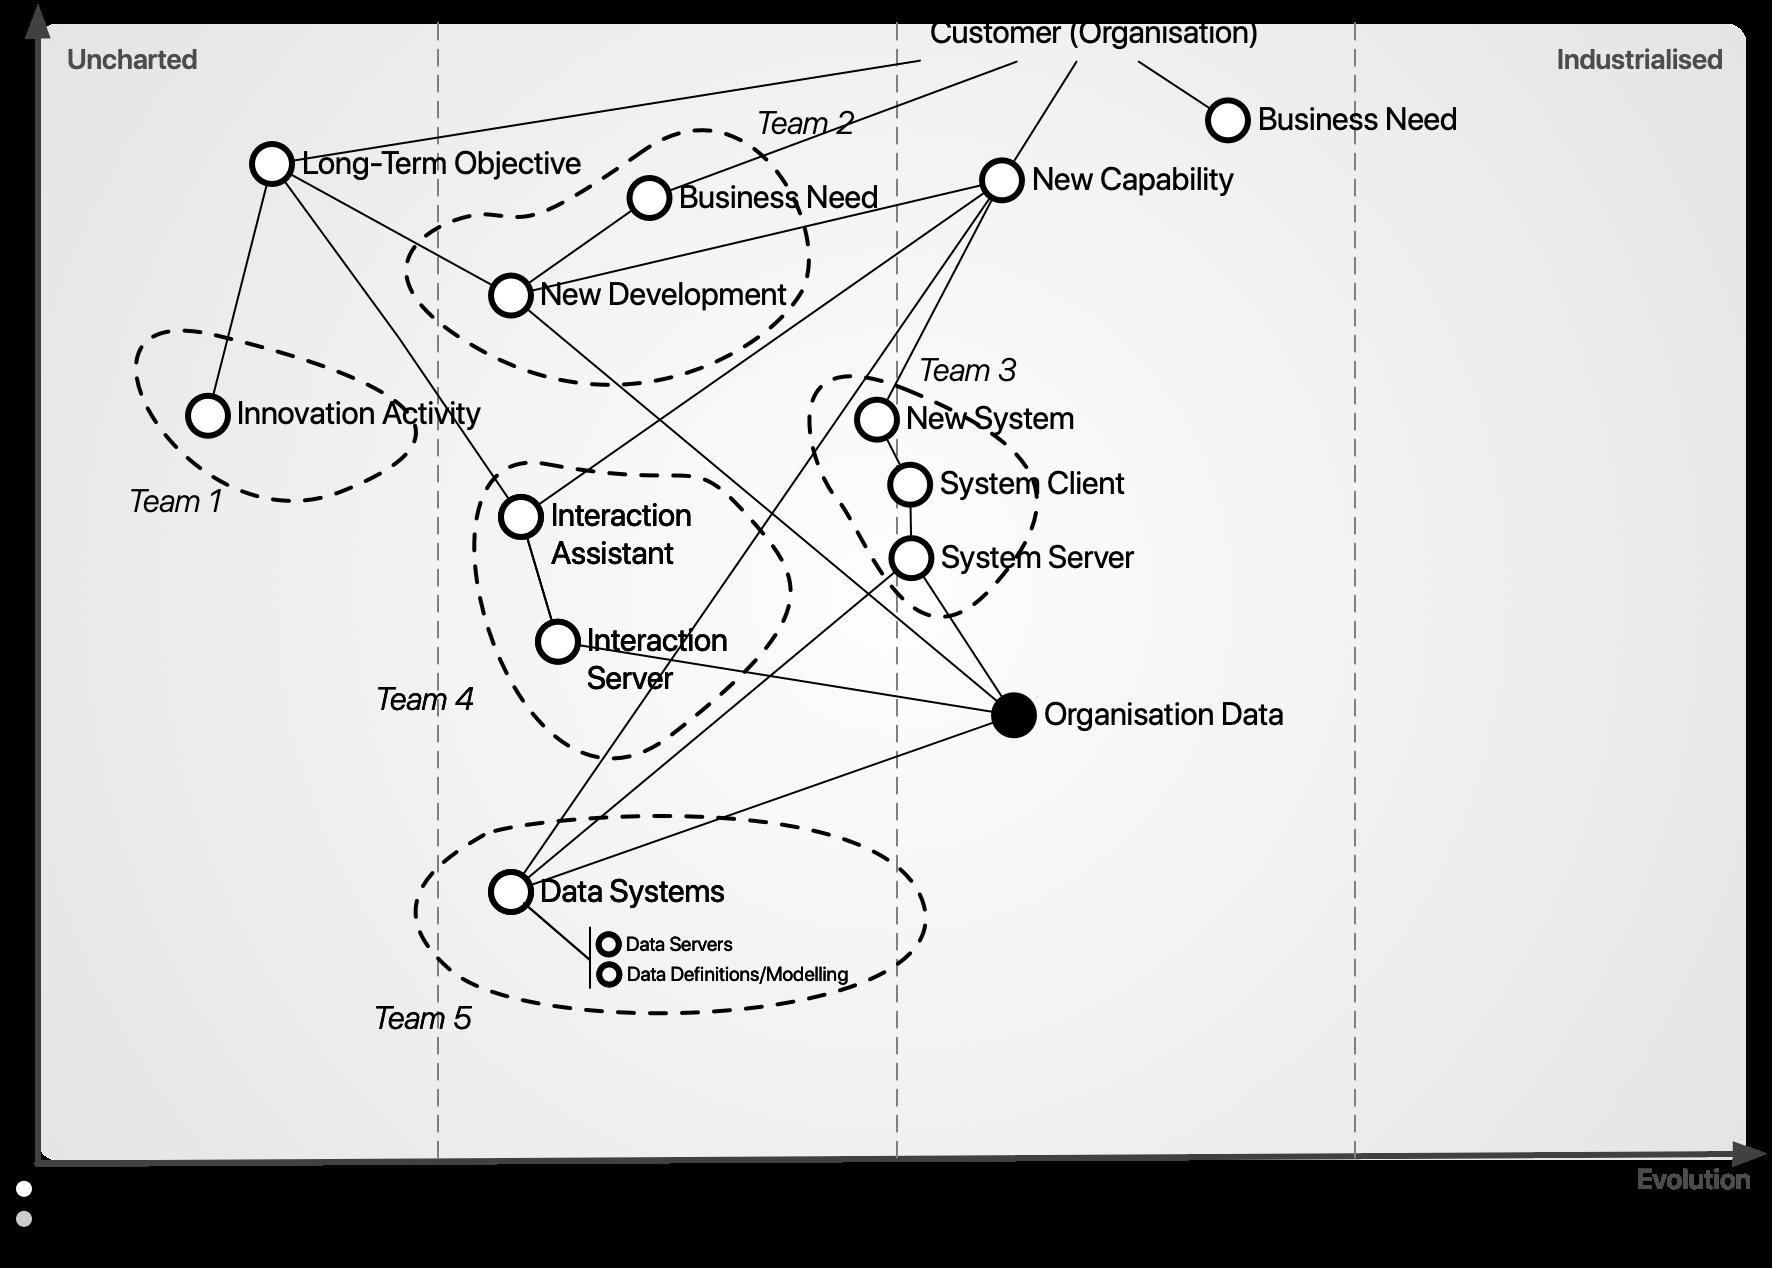 Figure 1: Organisation Level Map (Simplified)